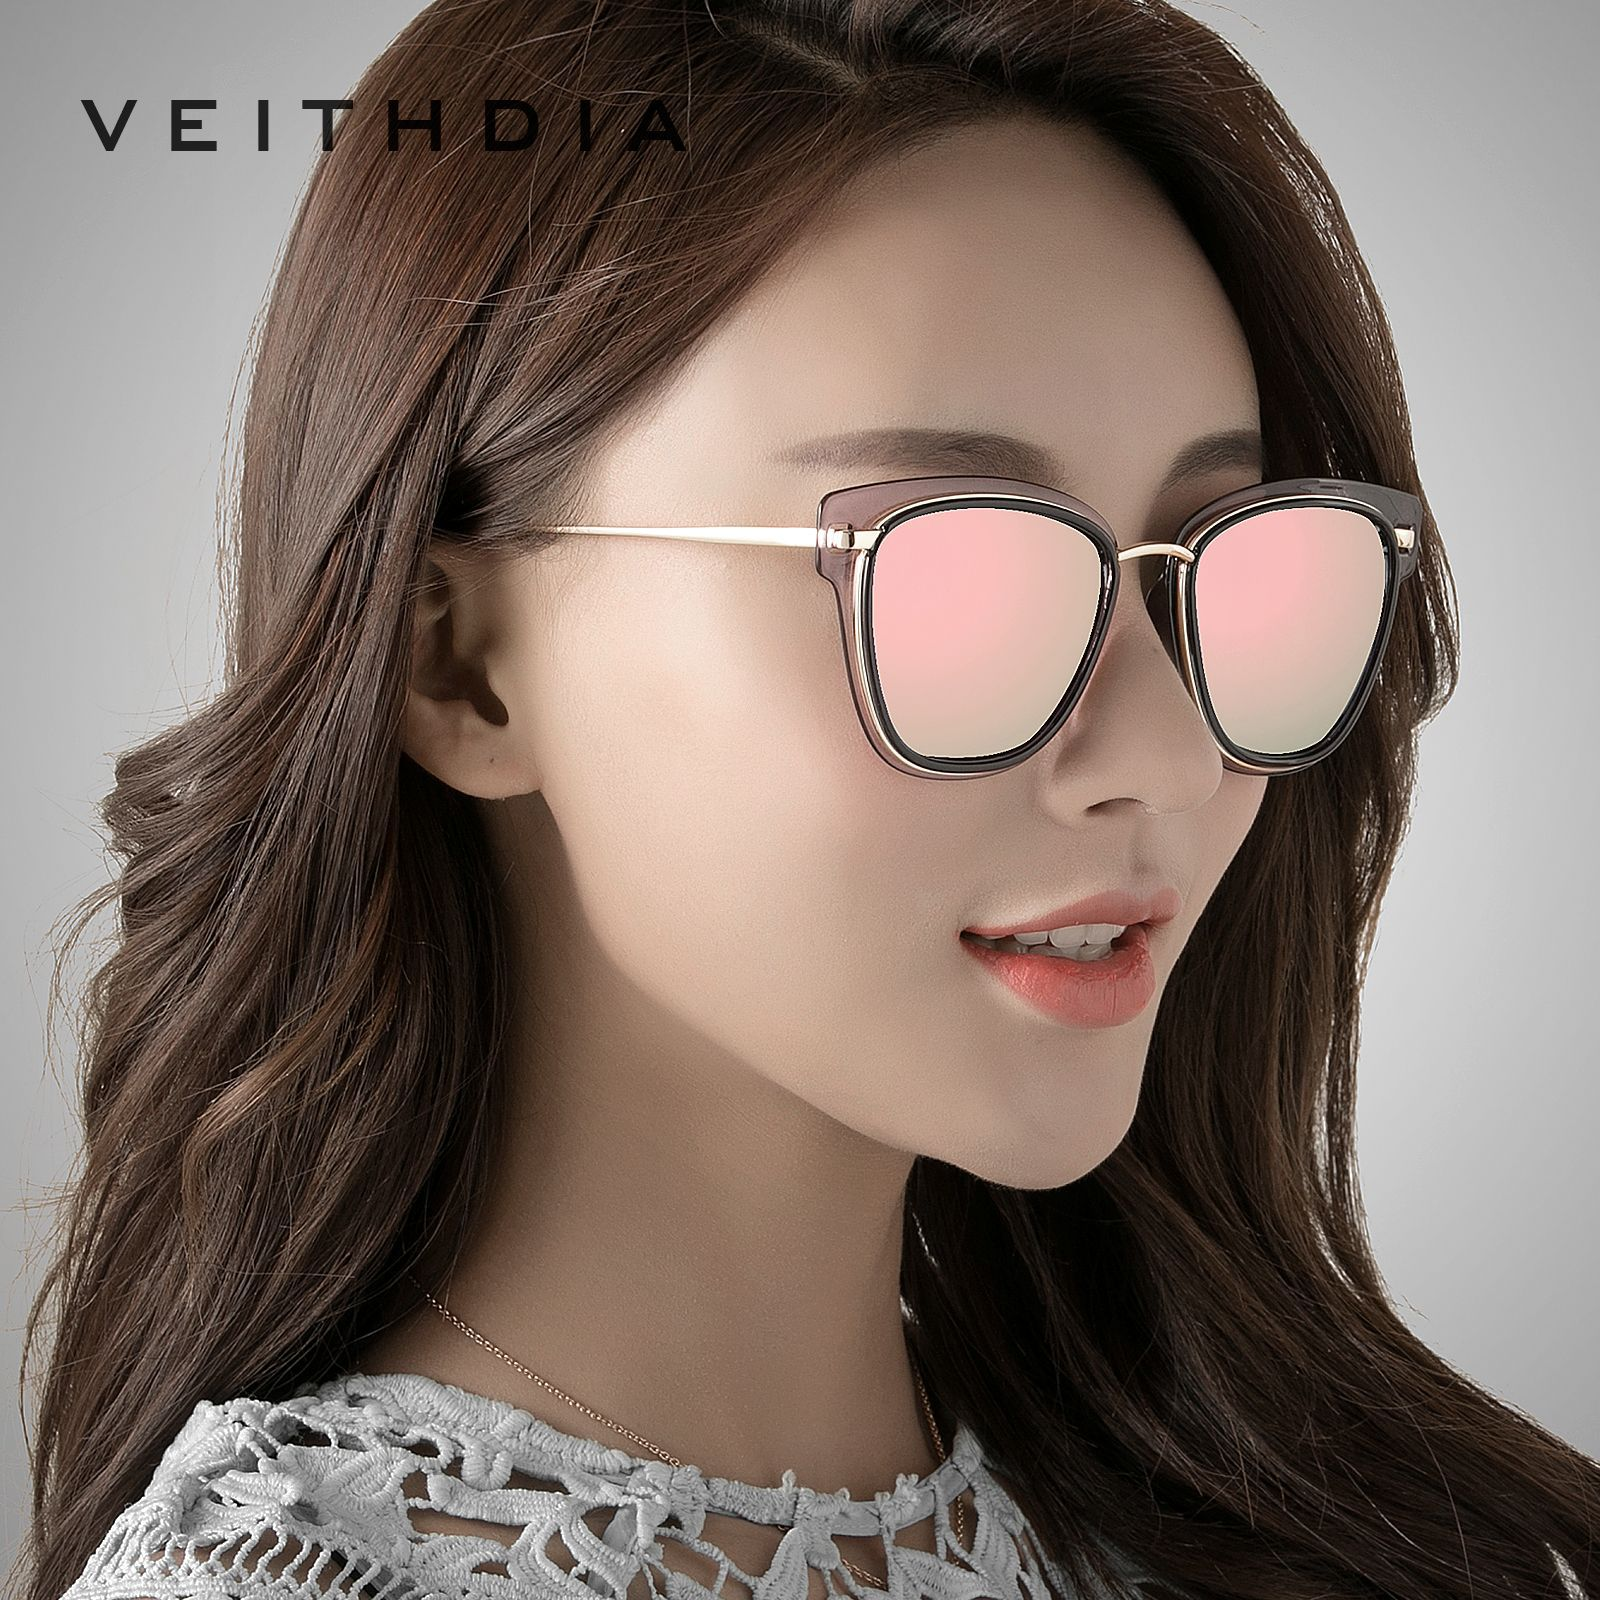 VEITHDIA Women's Sun glasses Polarized Mirror Lens Luxury Ladies Cat Eye Designer Sunglasses Eyewear For Women oculos 3038